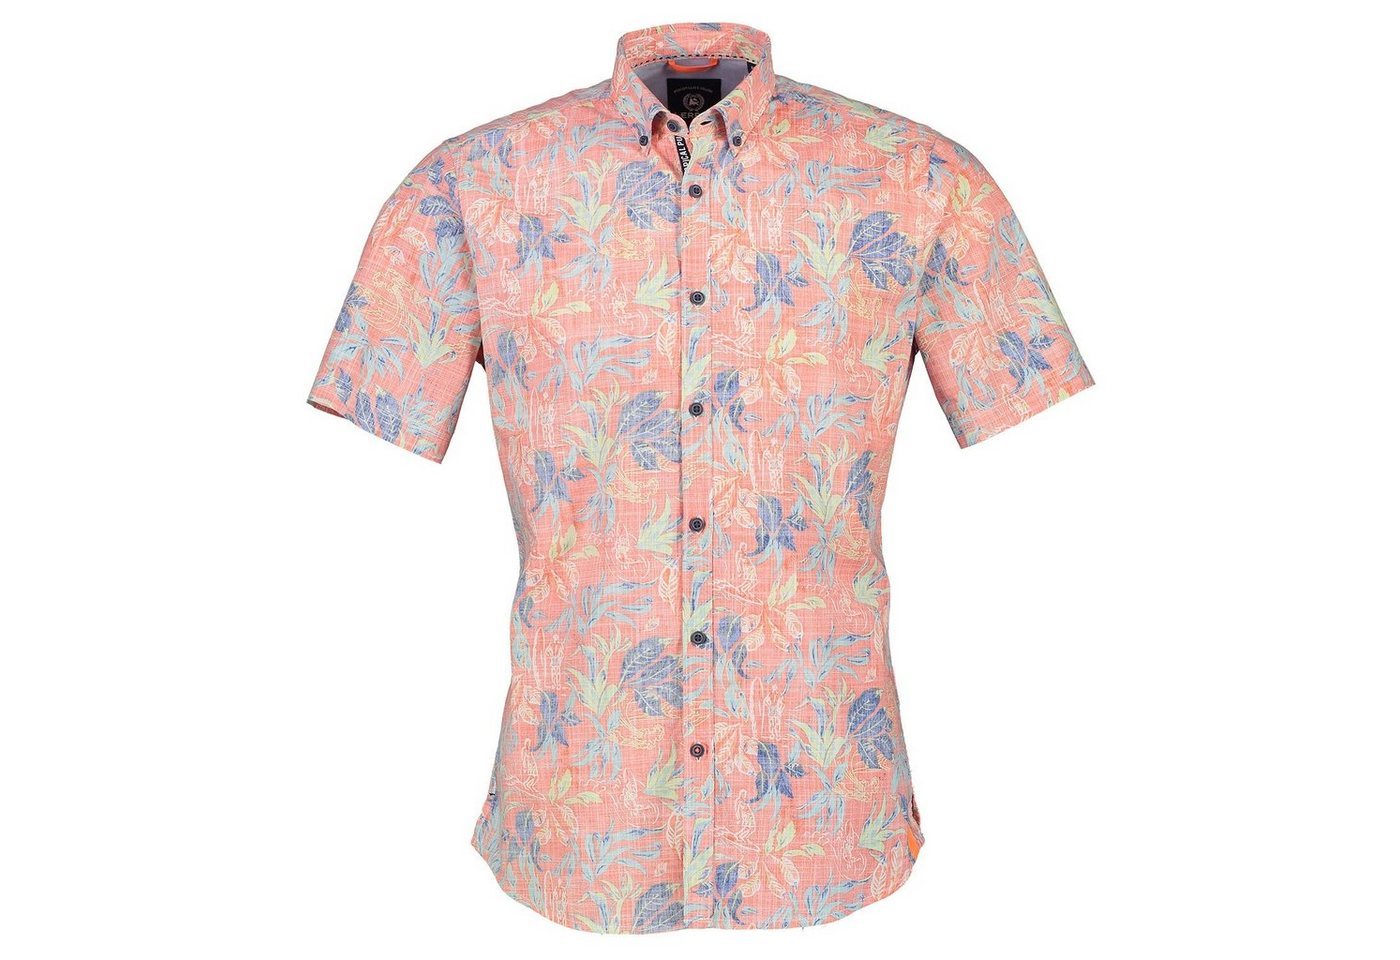 LERROS Hawaiihemd | Bekleidung > Hemden > Hawaiihemden | Orange | LERROS